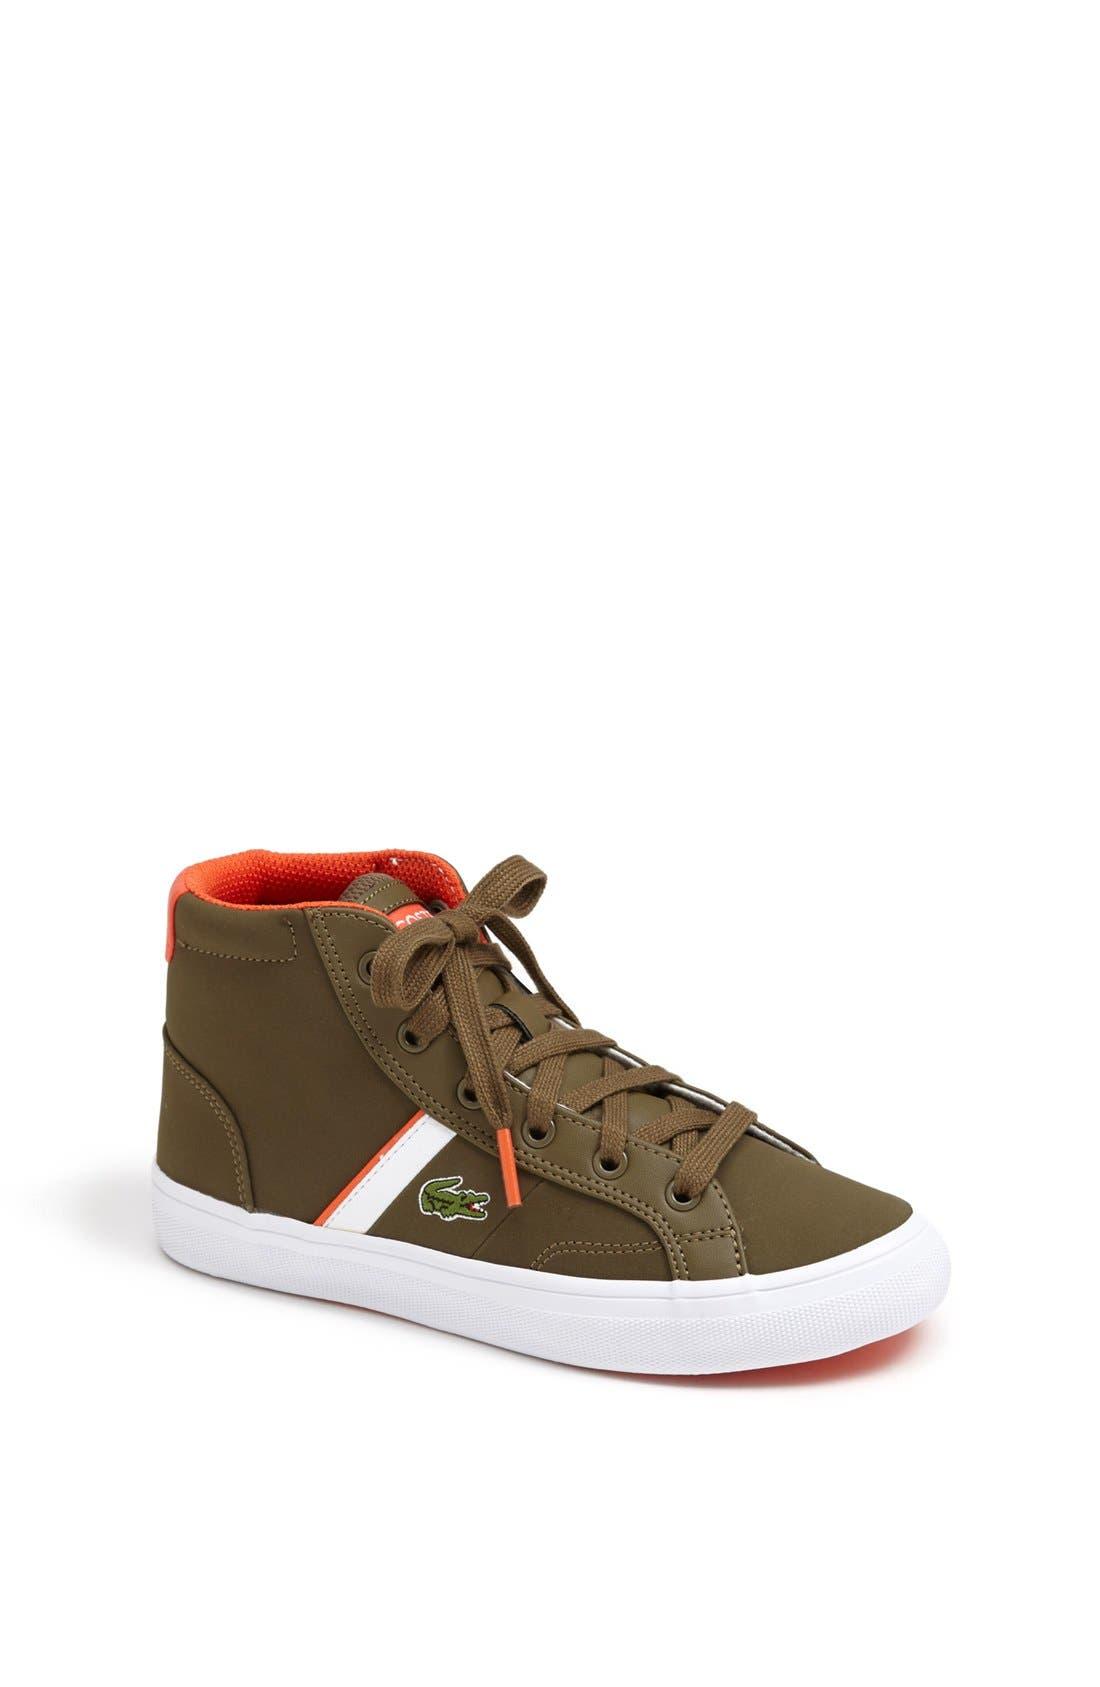 Alternate Image 1 Selected - Lacoste 'Fairlead' High Top Sneaker (Toddler, Little Kid & Big Kid)